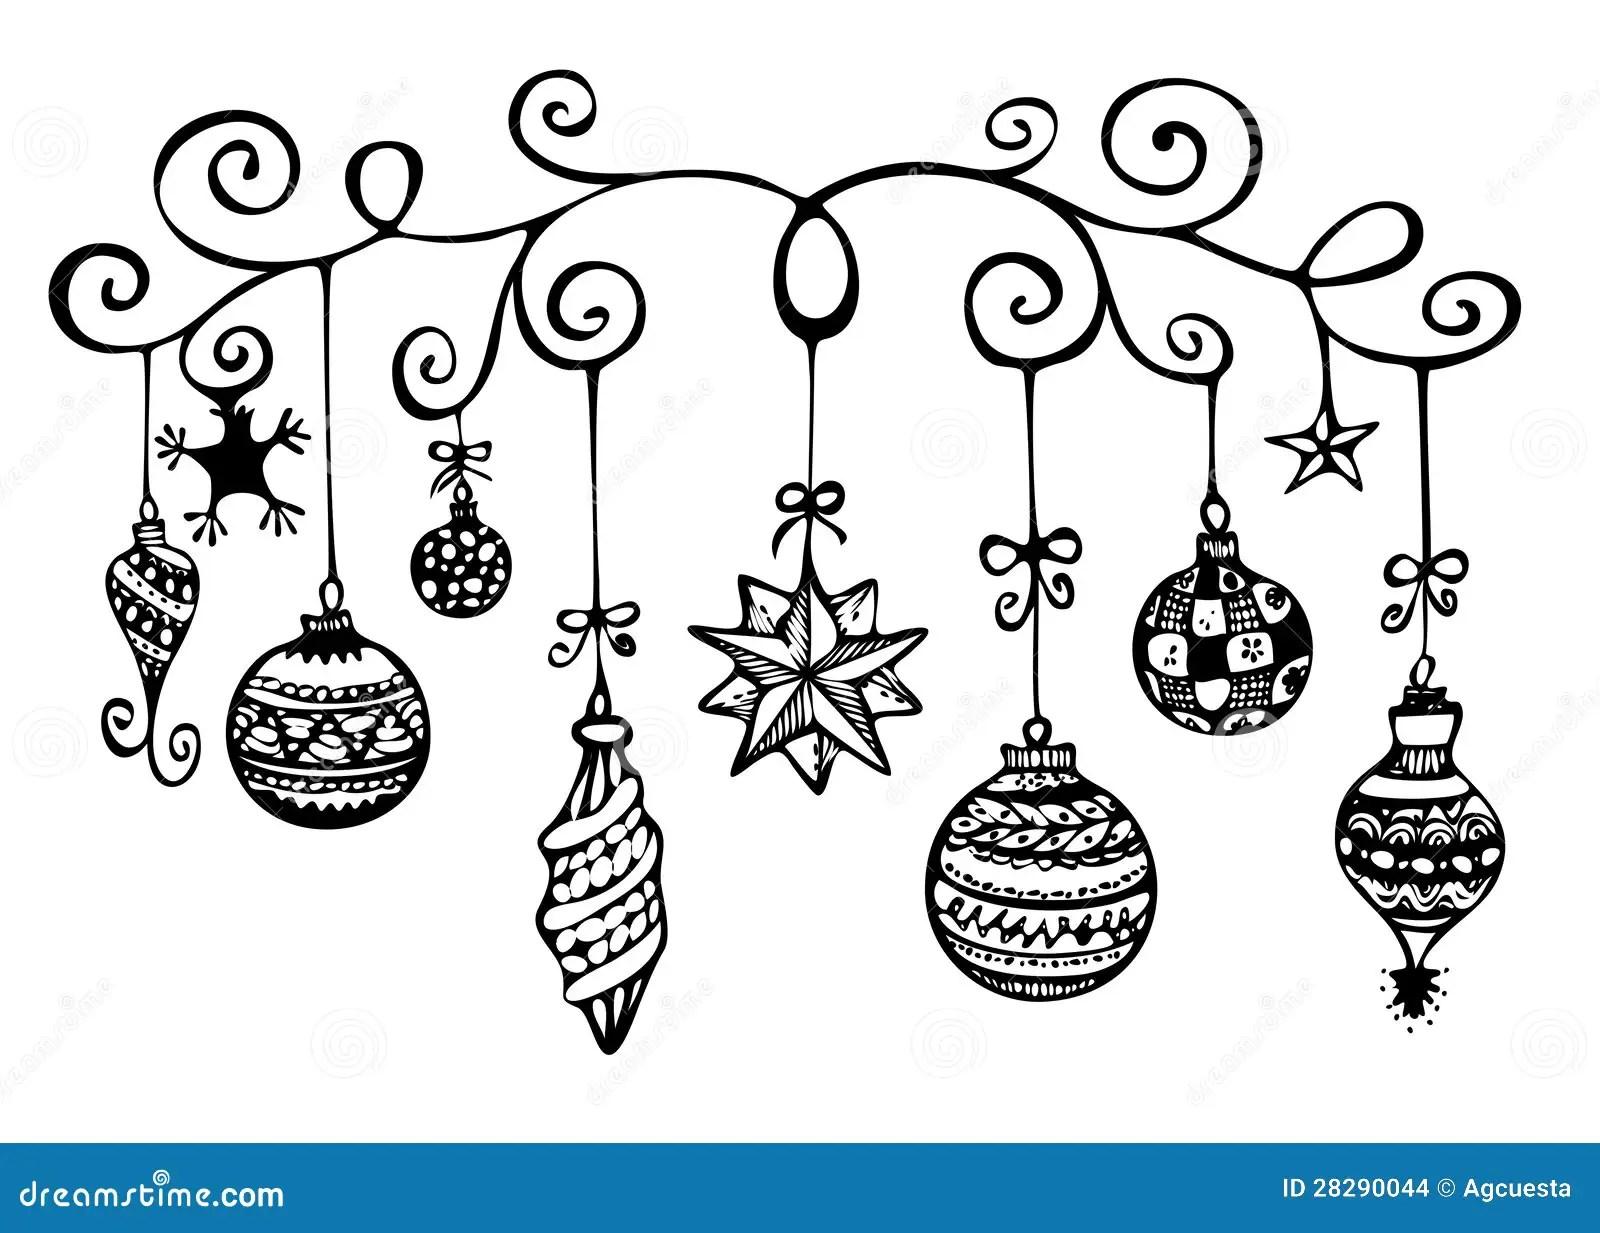 Christmas Ornaments Sketch Stock Illustration